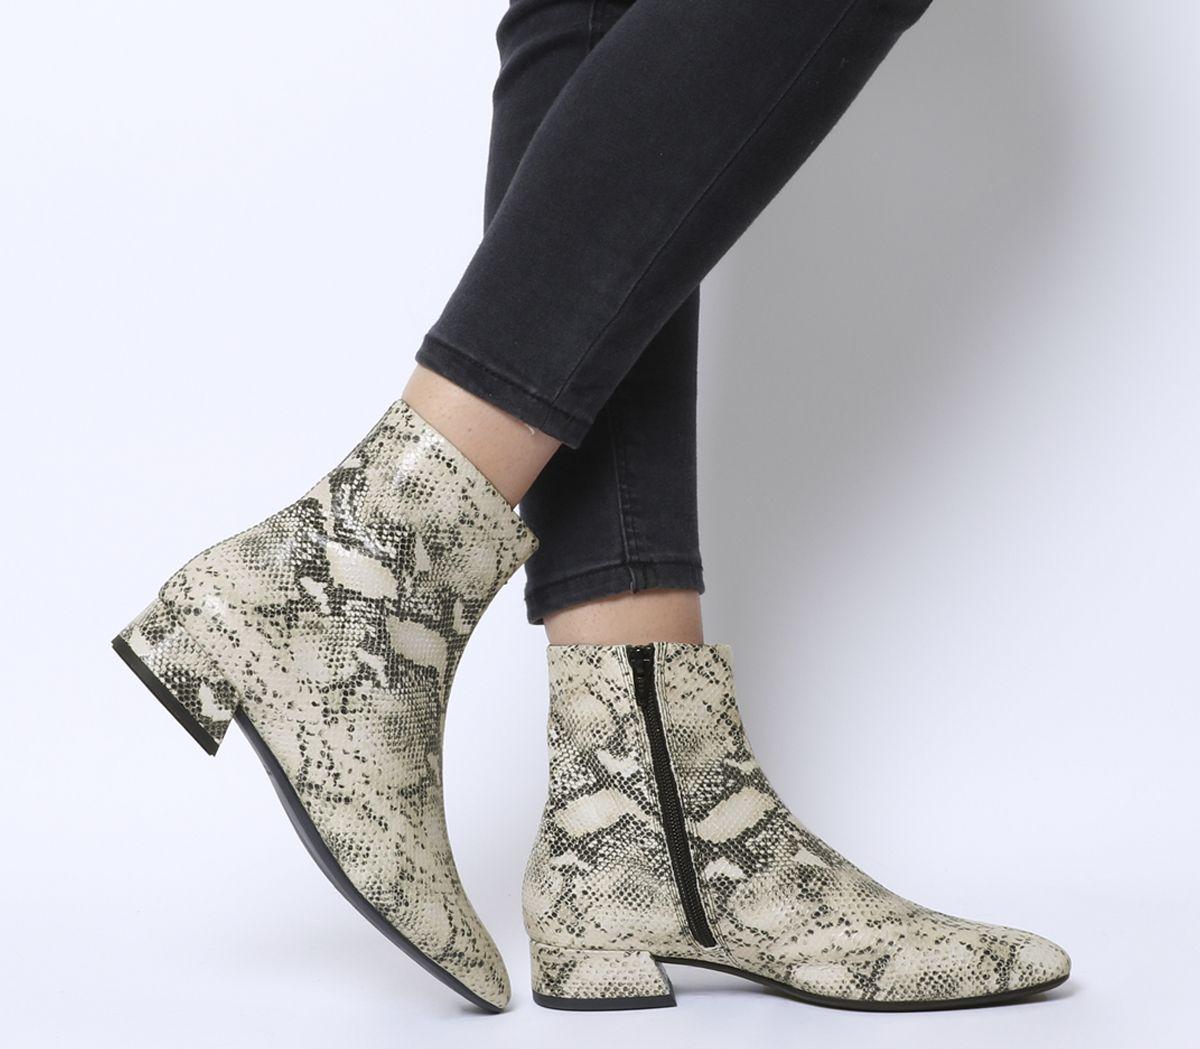 a85f99fefaf Vagabond Joyce Ankle Boots Sand Black - Ankle Boots